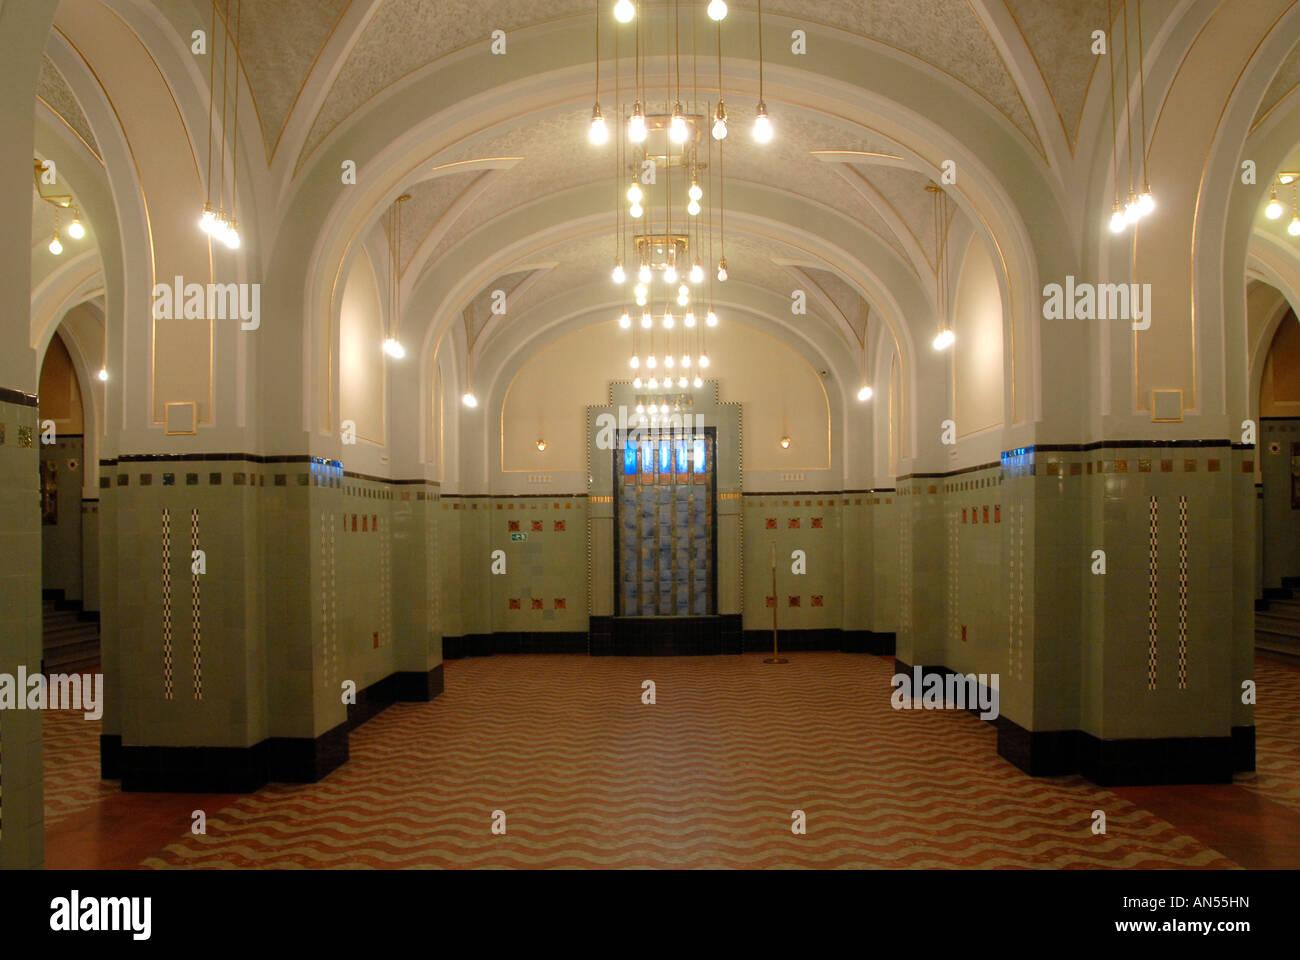 Interior Design Art Nouveau Stock Photos & Interior Design Art ...